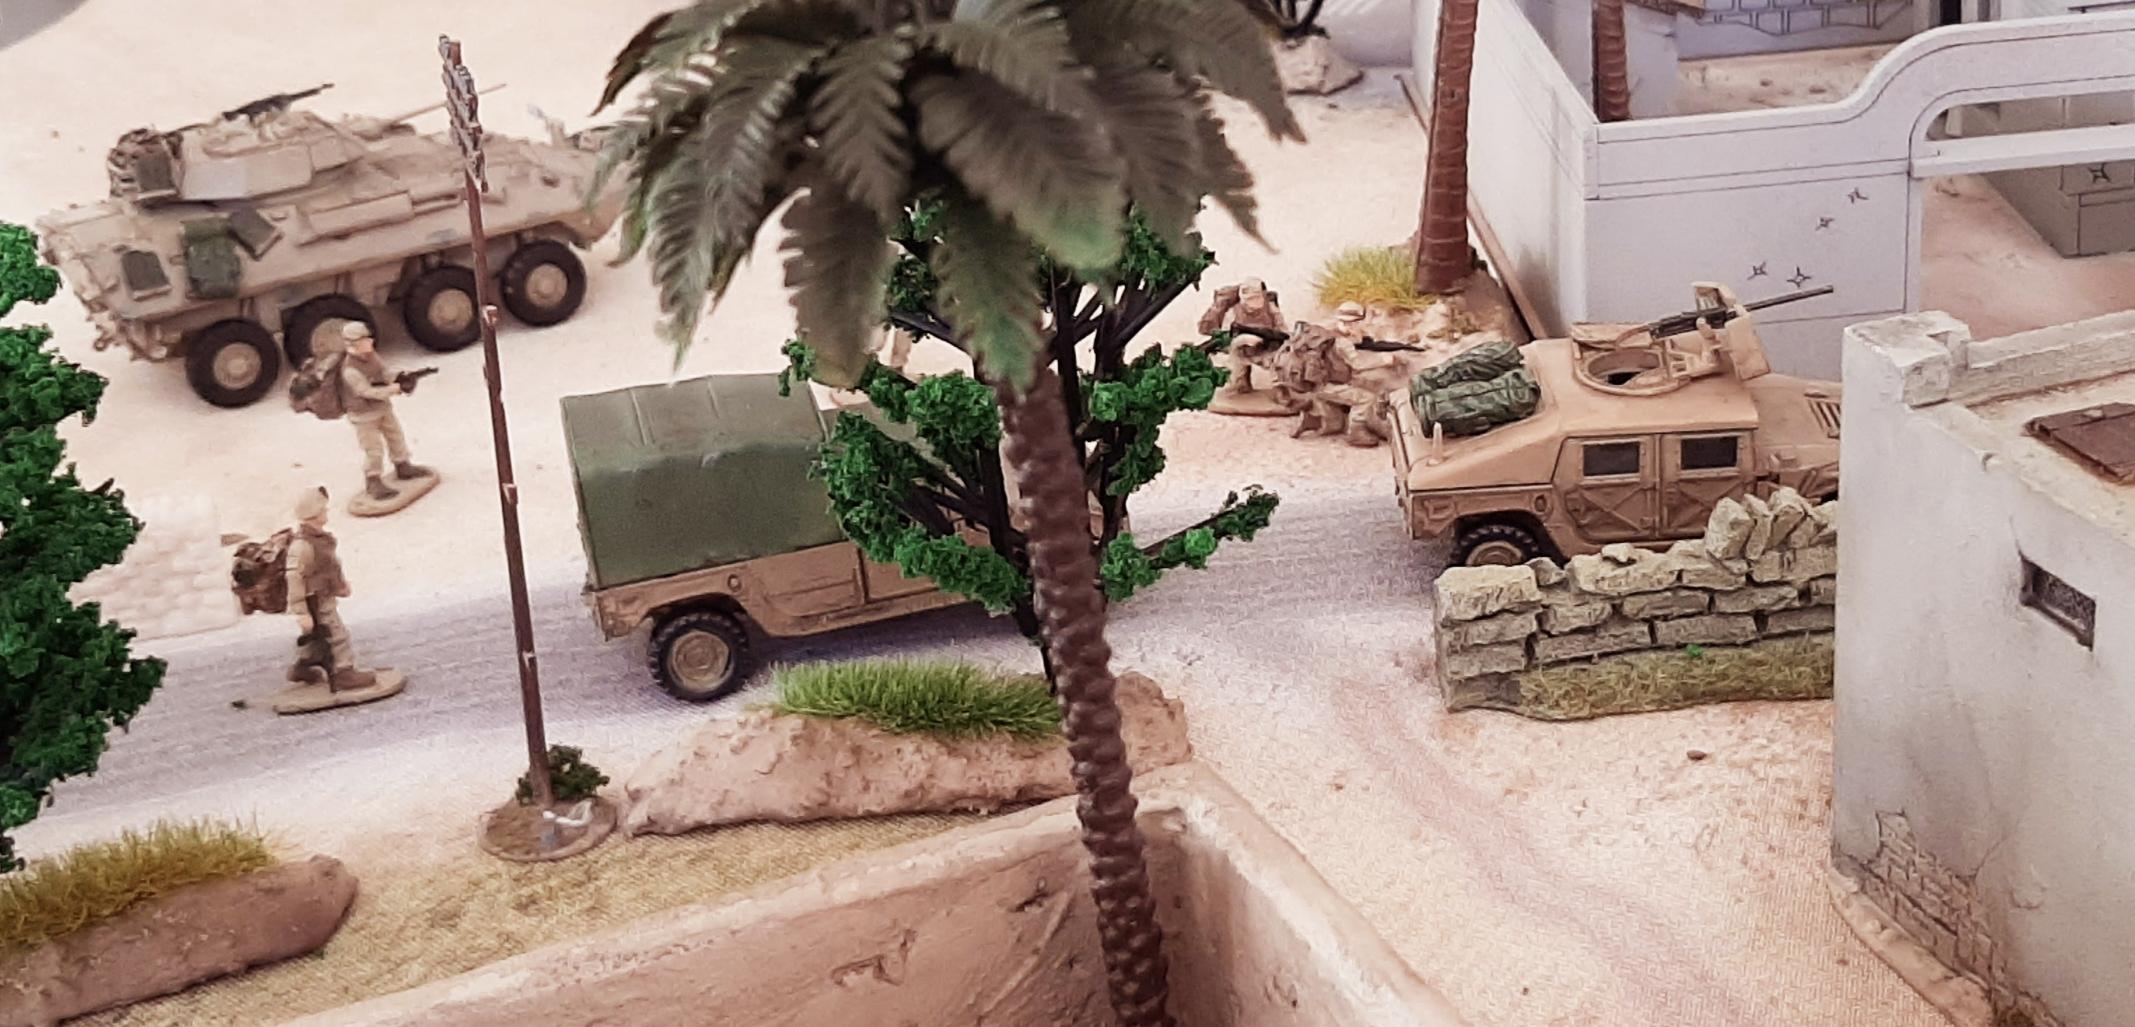 Diorama/Wargame Afghanistan 1/72 HLJs5